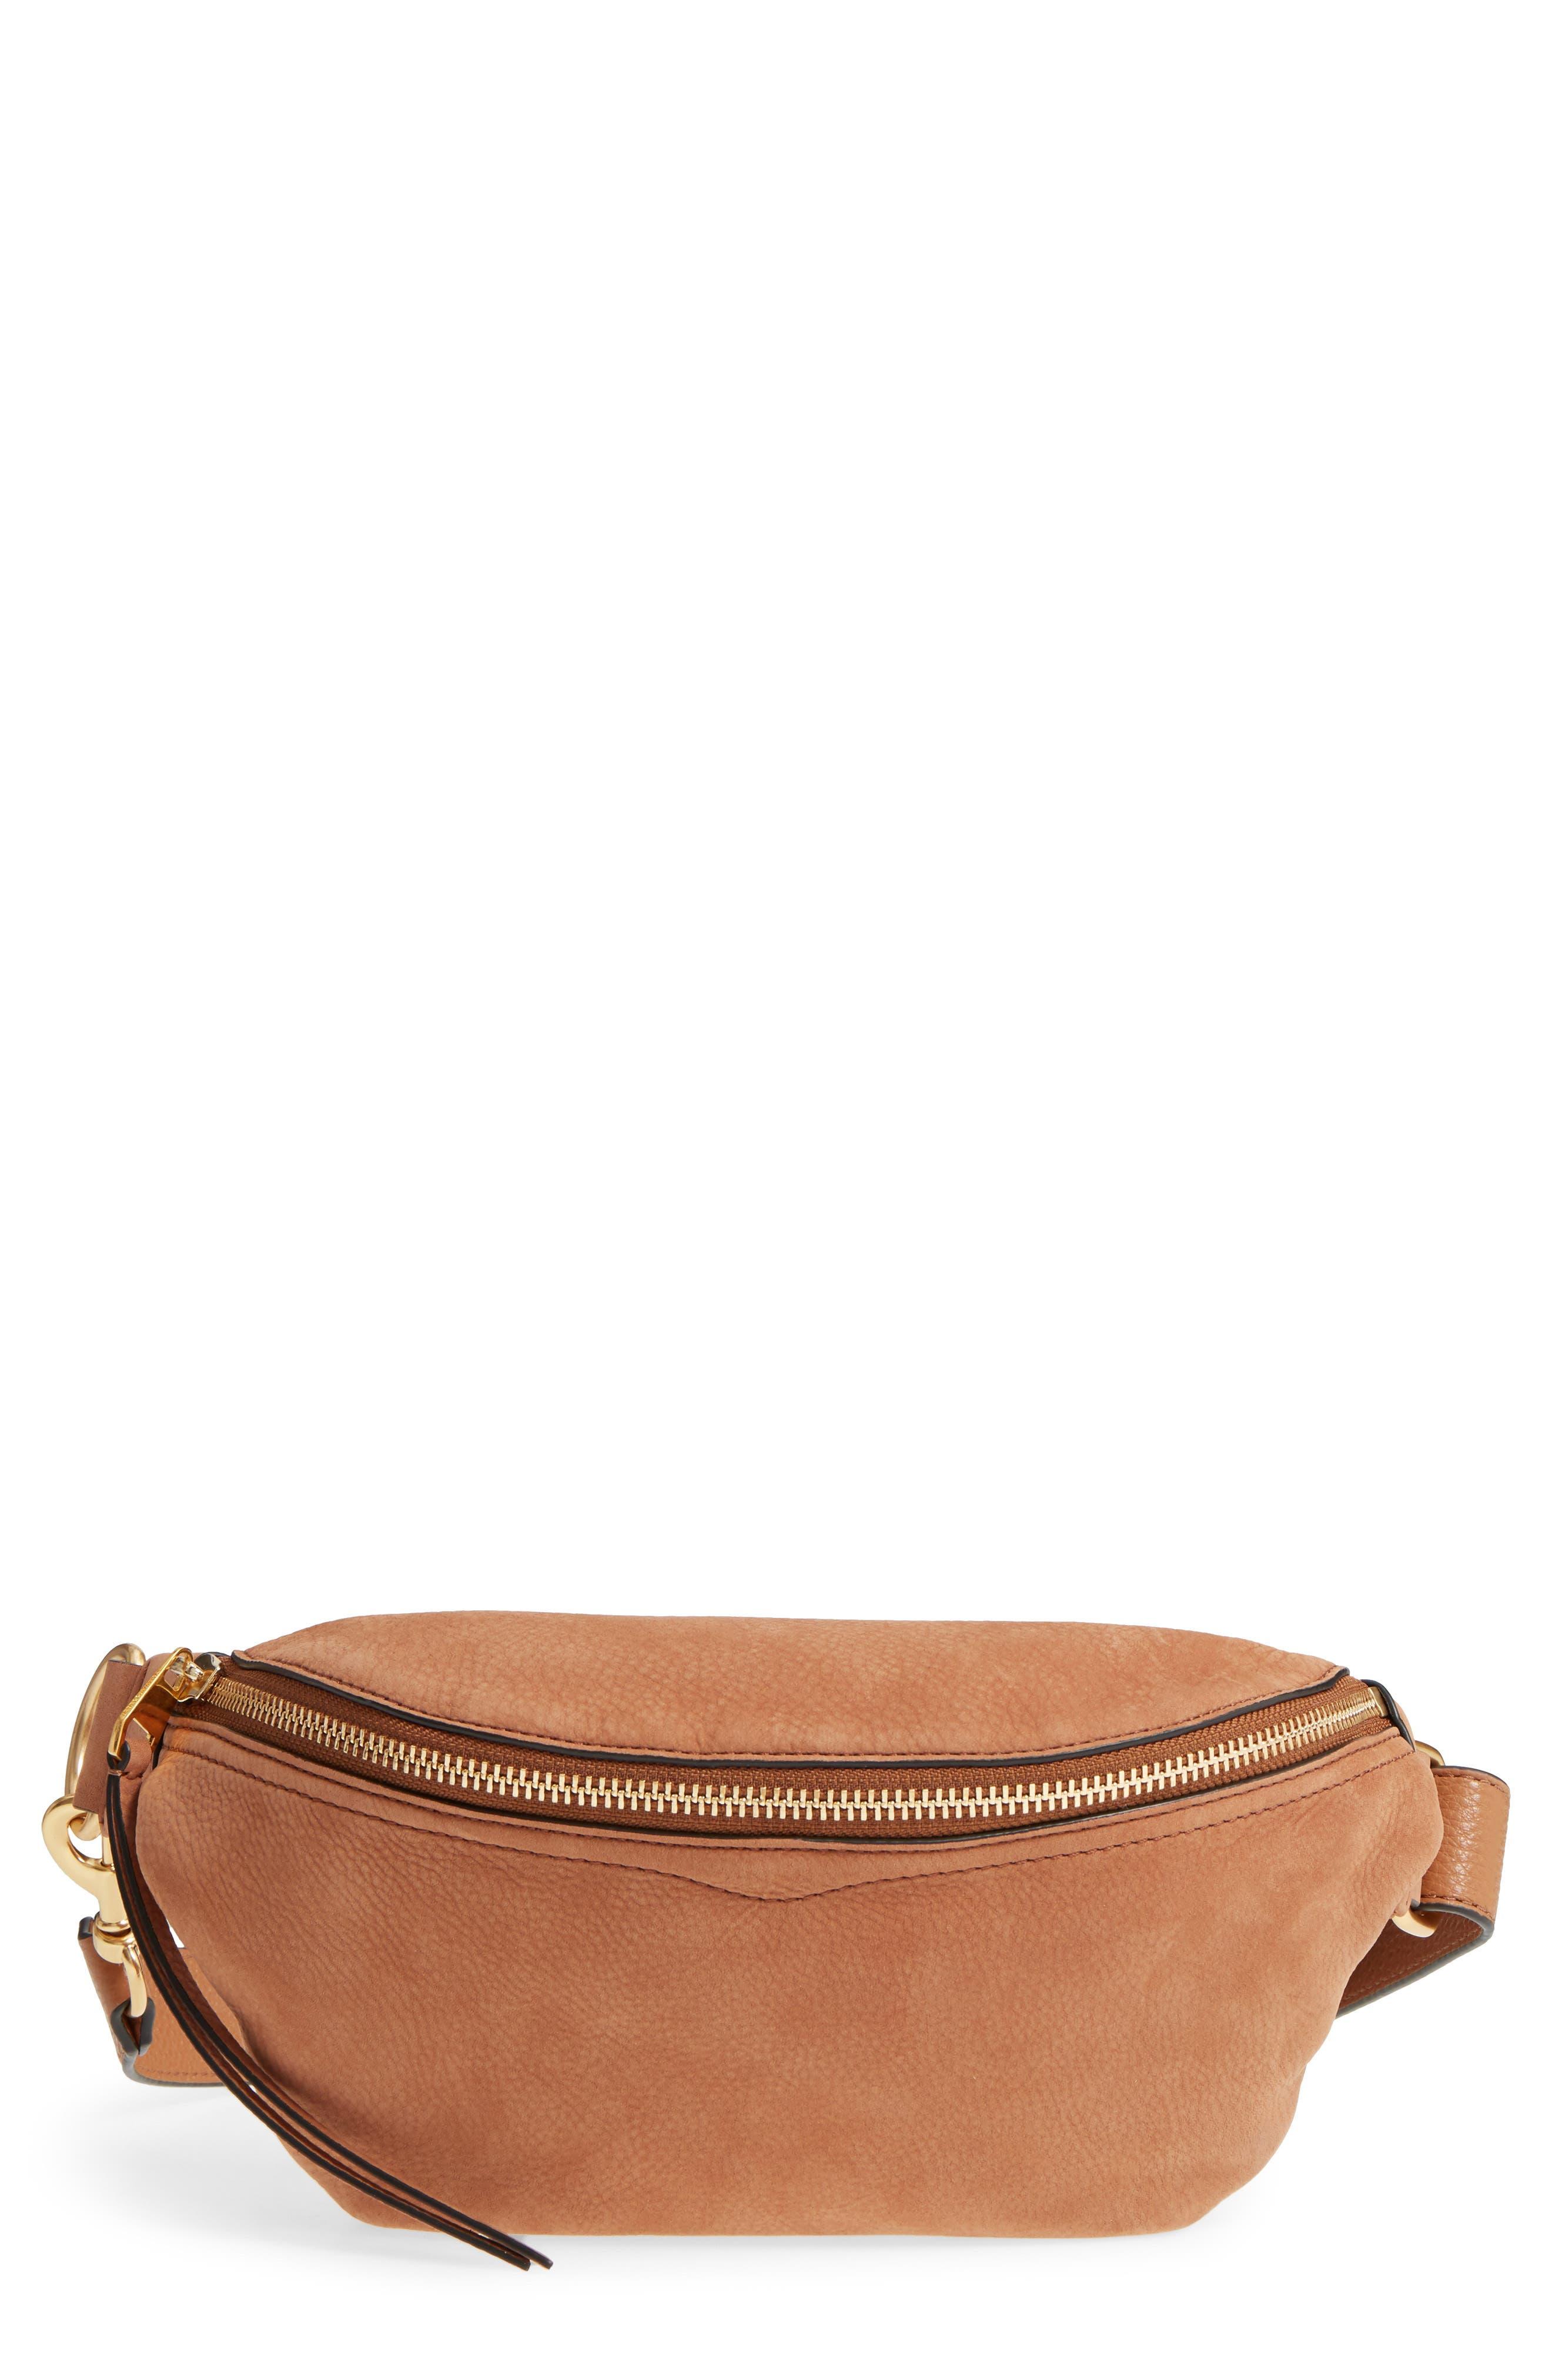 Bree Leather Belt Bag,                             Main thumbnail 1, color,                             230